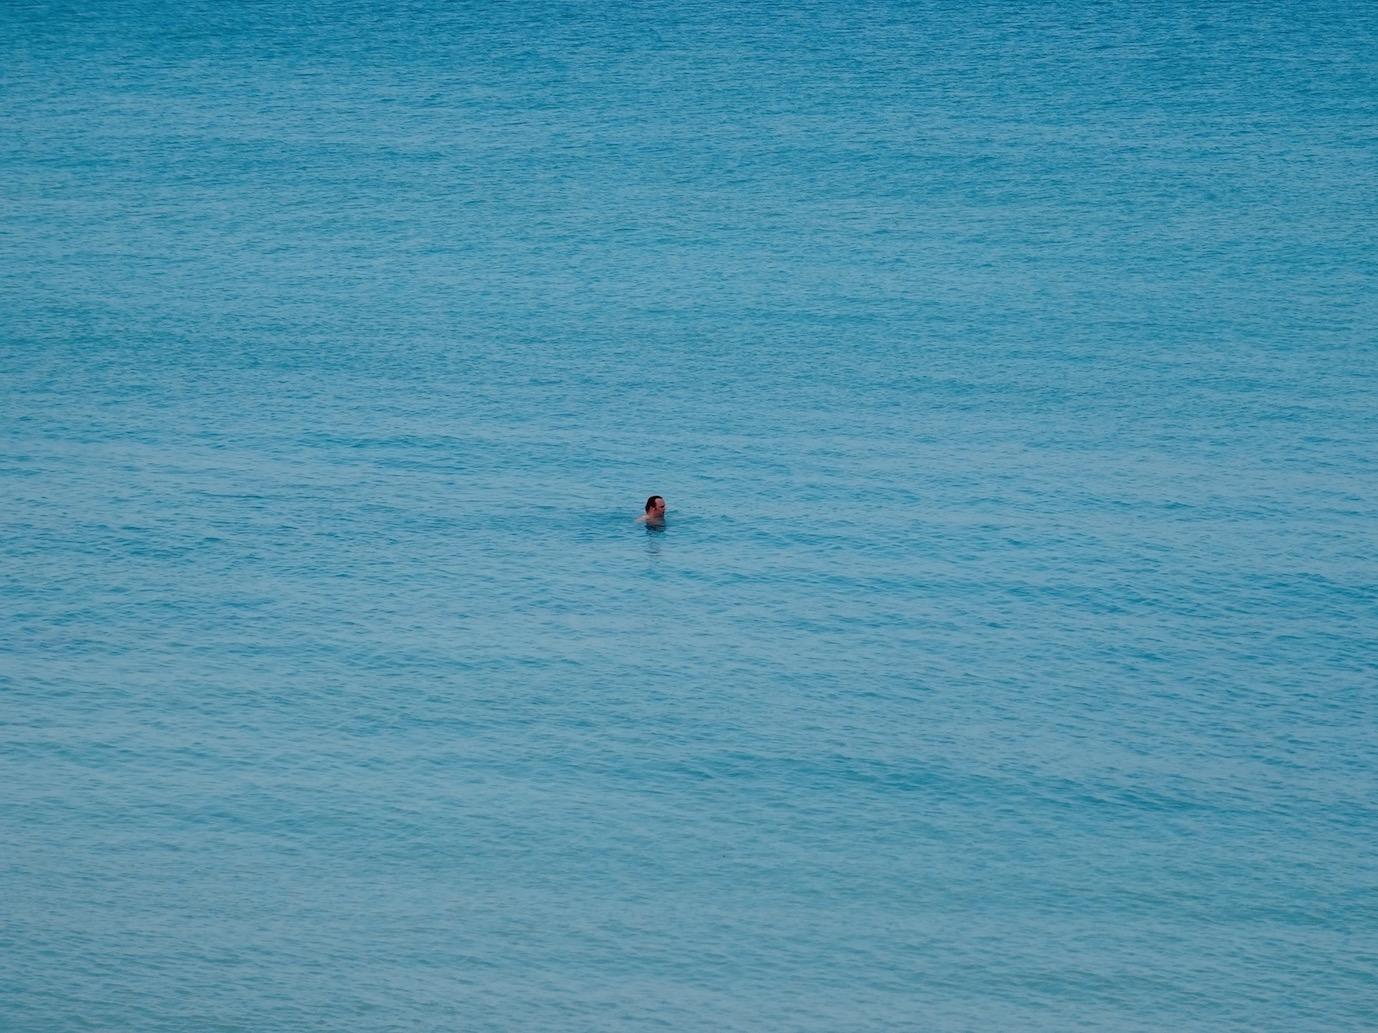 Swimming Gulf of Thailand Cambodia.